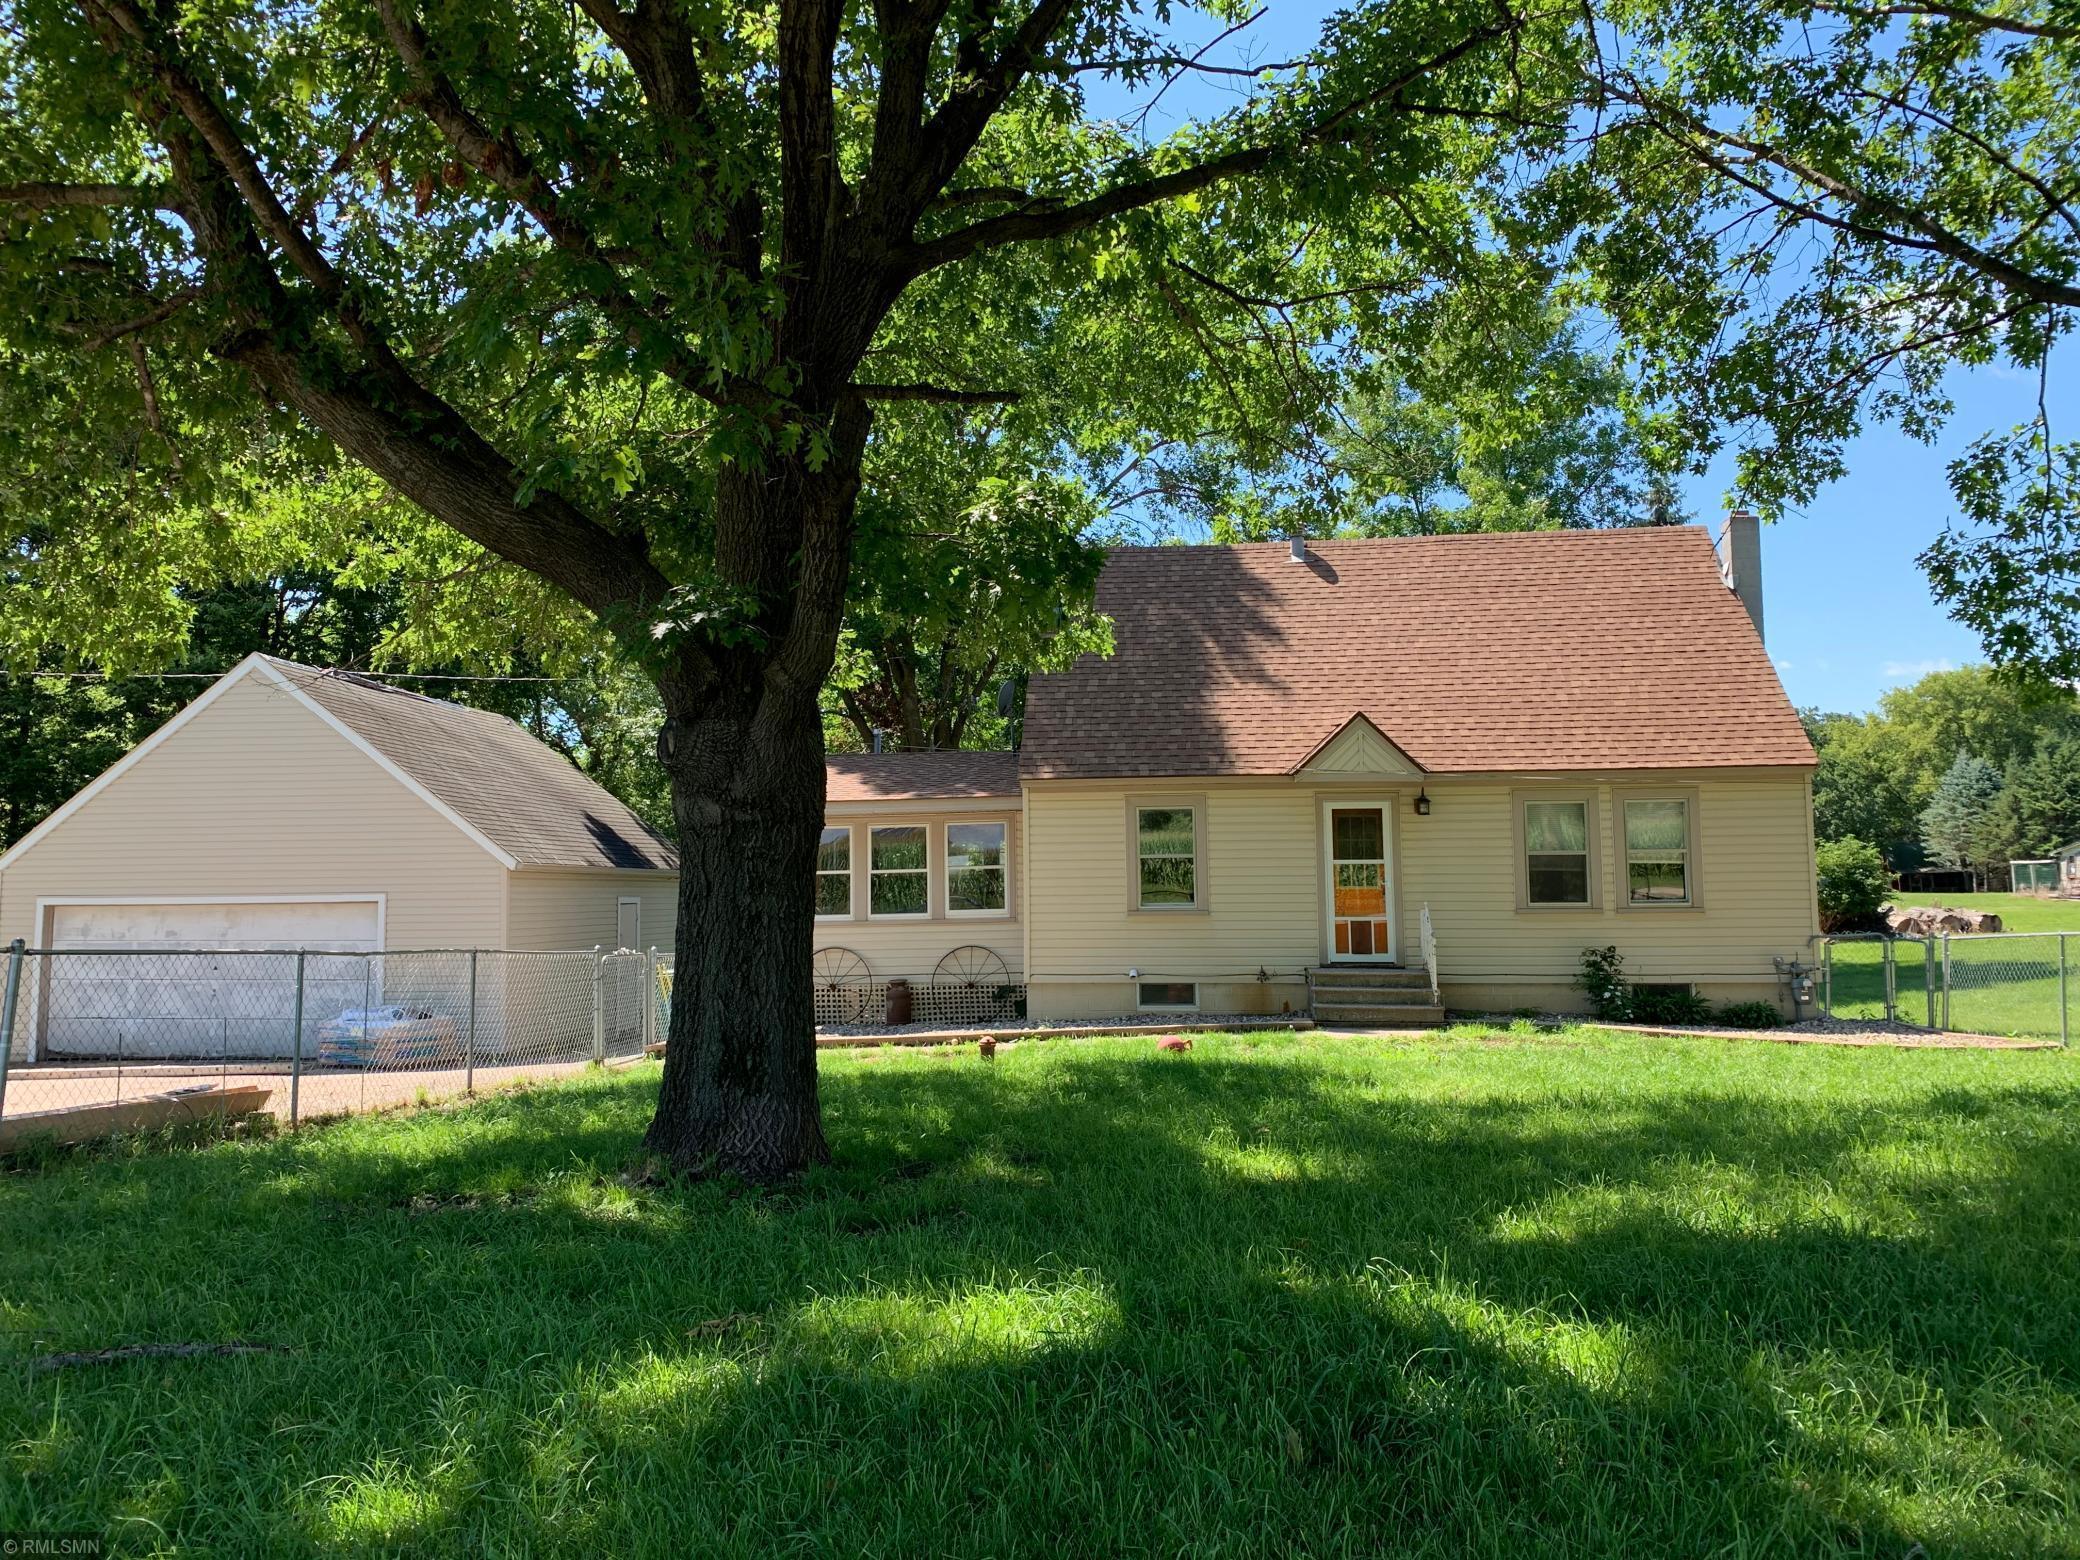 33298 301st Avenue Property Photo - Le Sueur, MN real estate listing